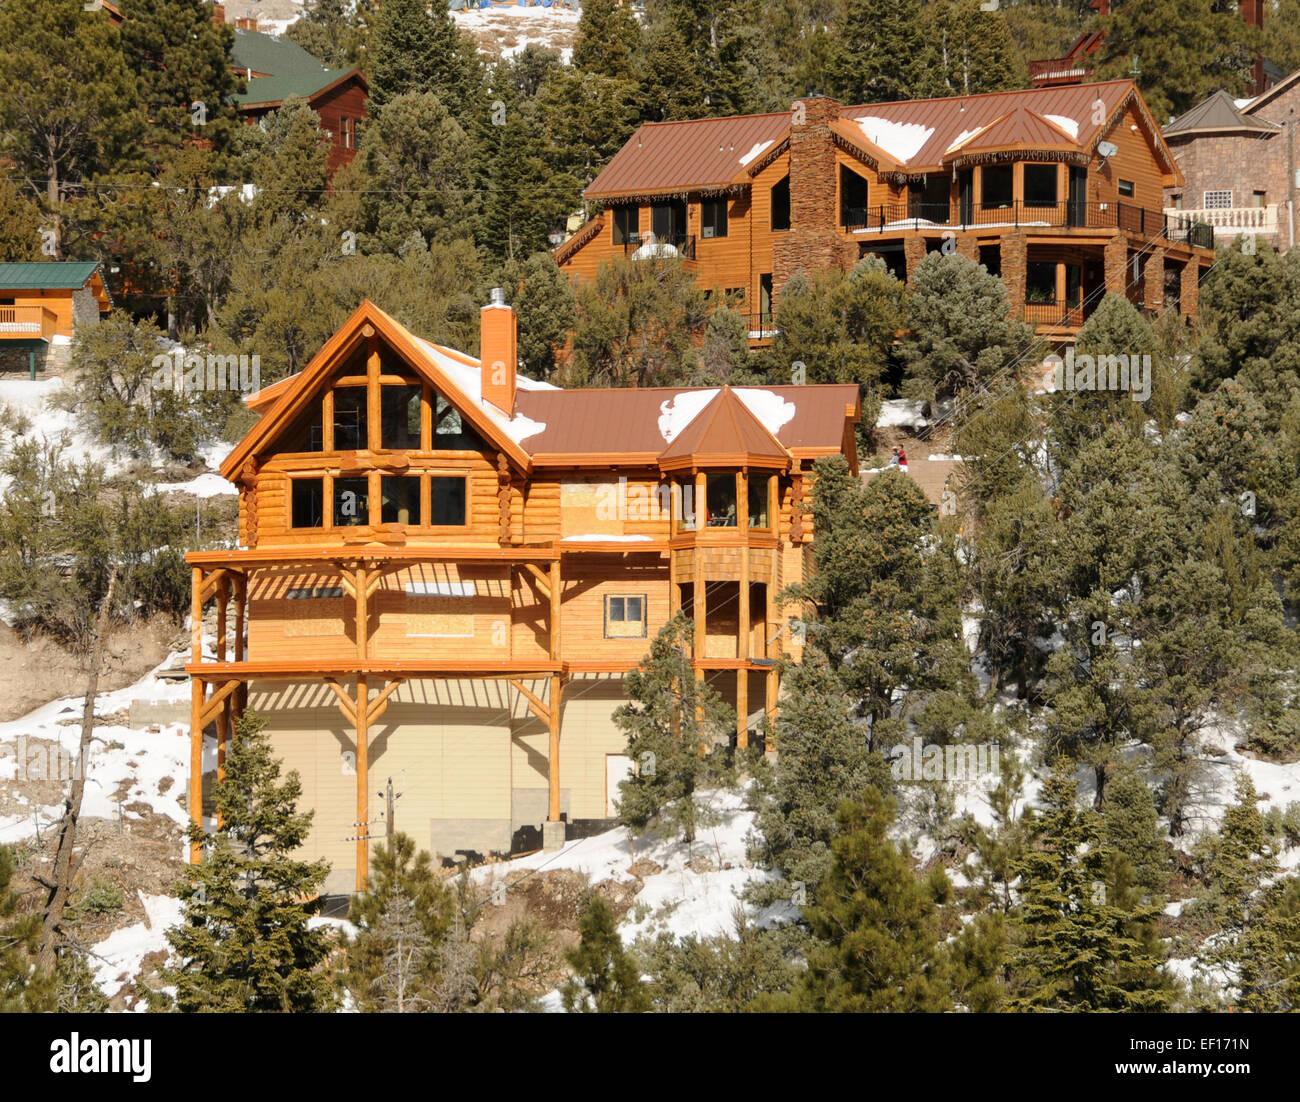 Luxury Lake Homes On Mountain: Luxury Log Cabins On A Snowy Mountain Slope Stock Photo